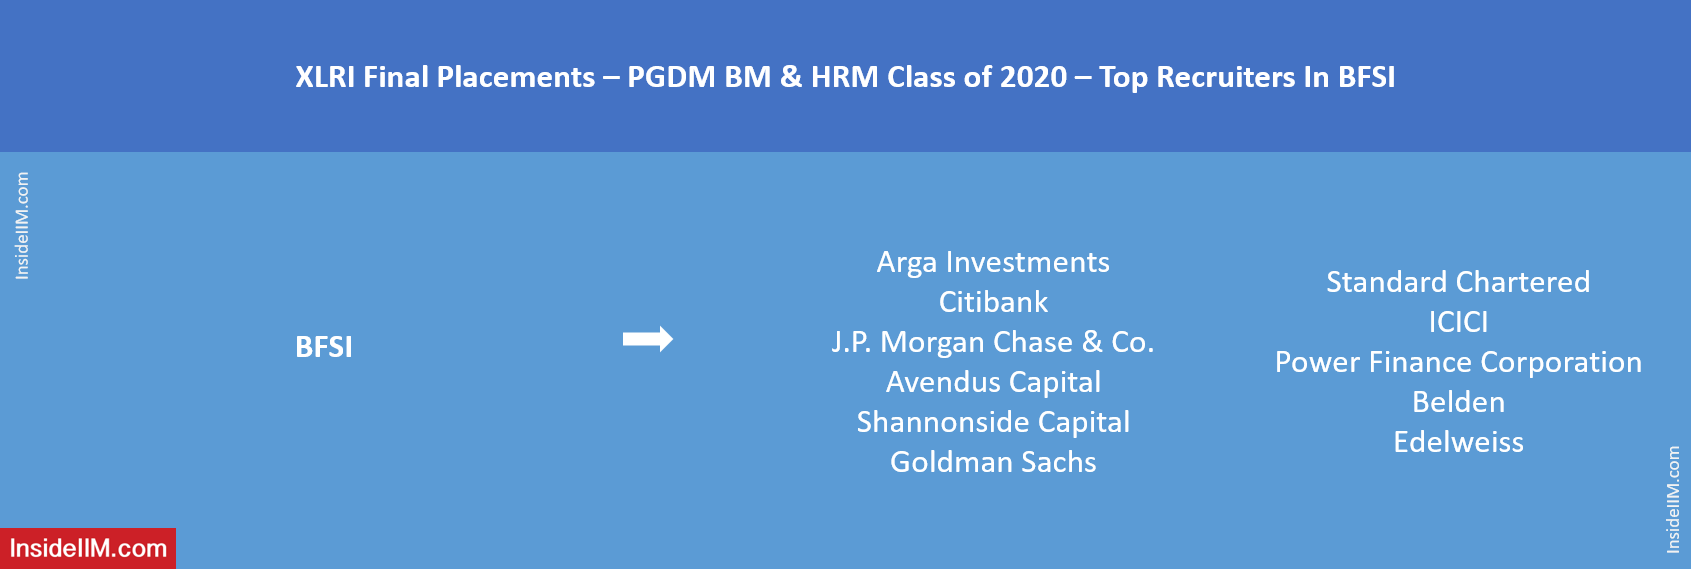 XLRI Final Placements 2020 - Top Finance Recruiters